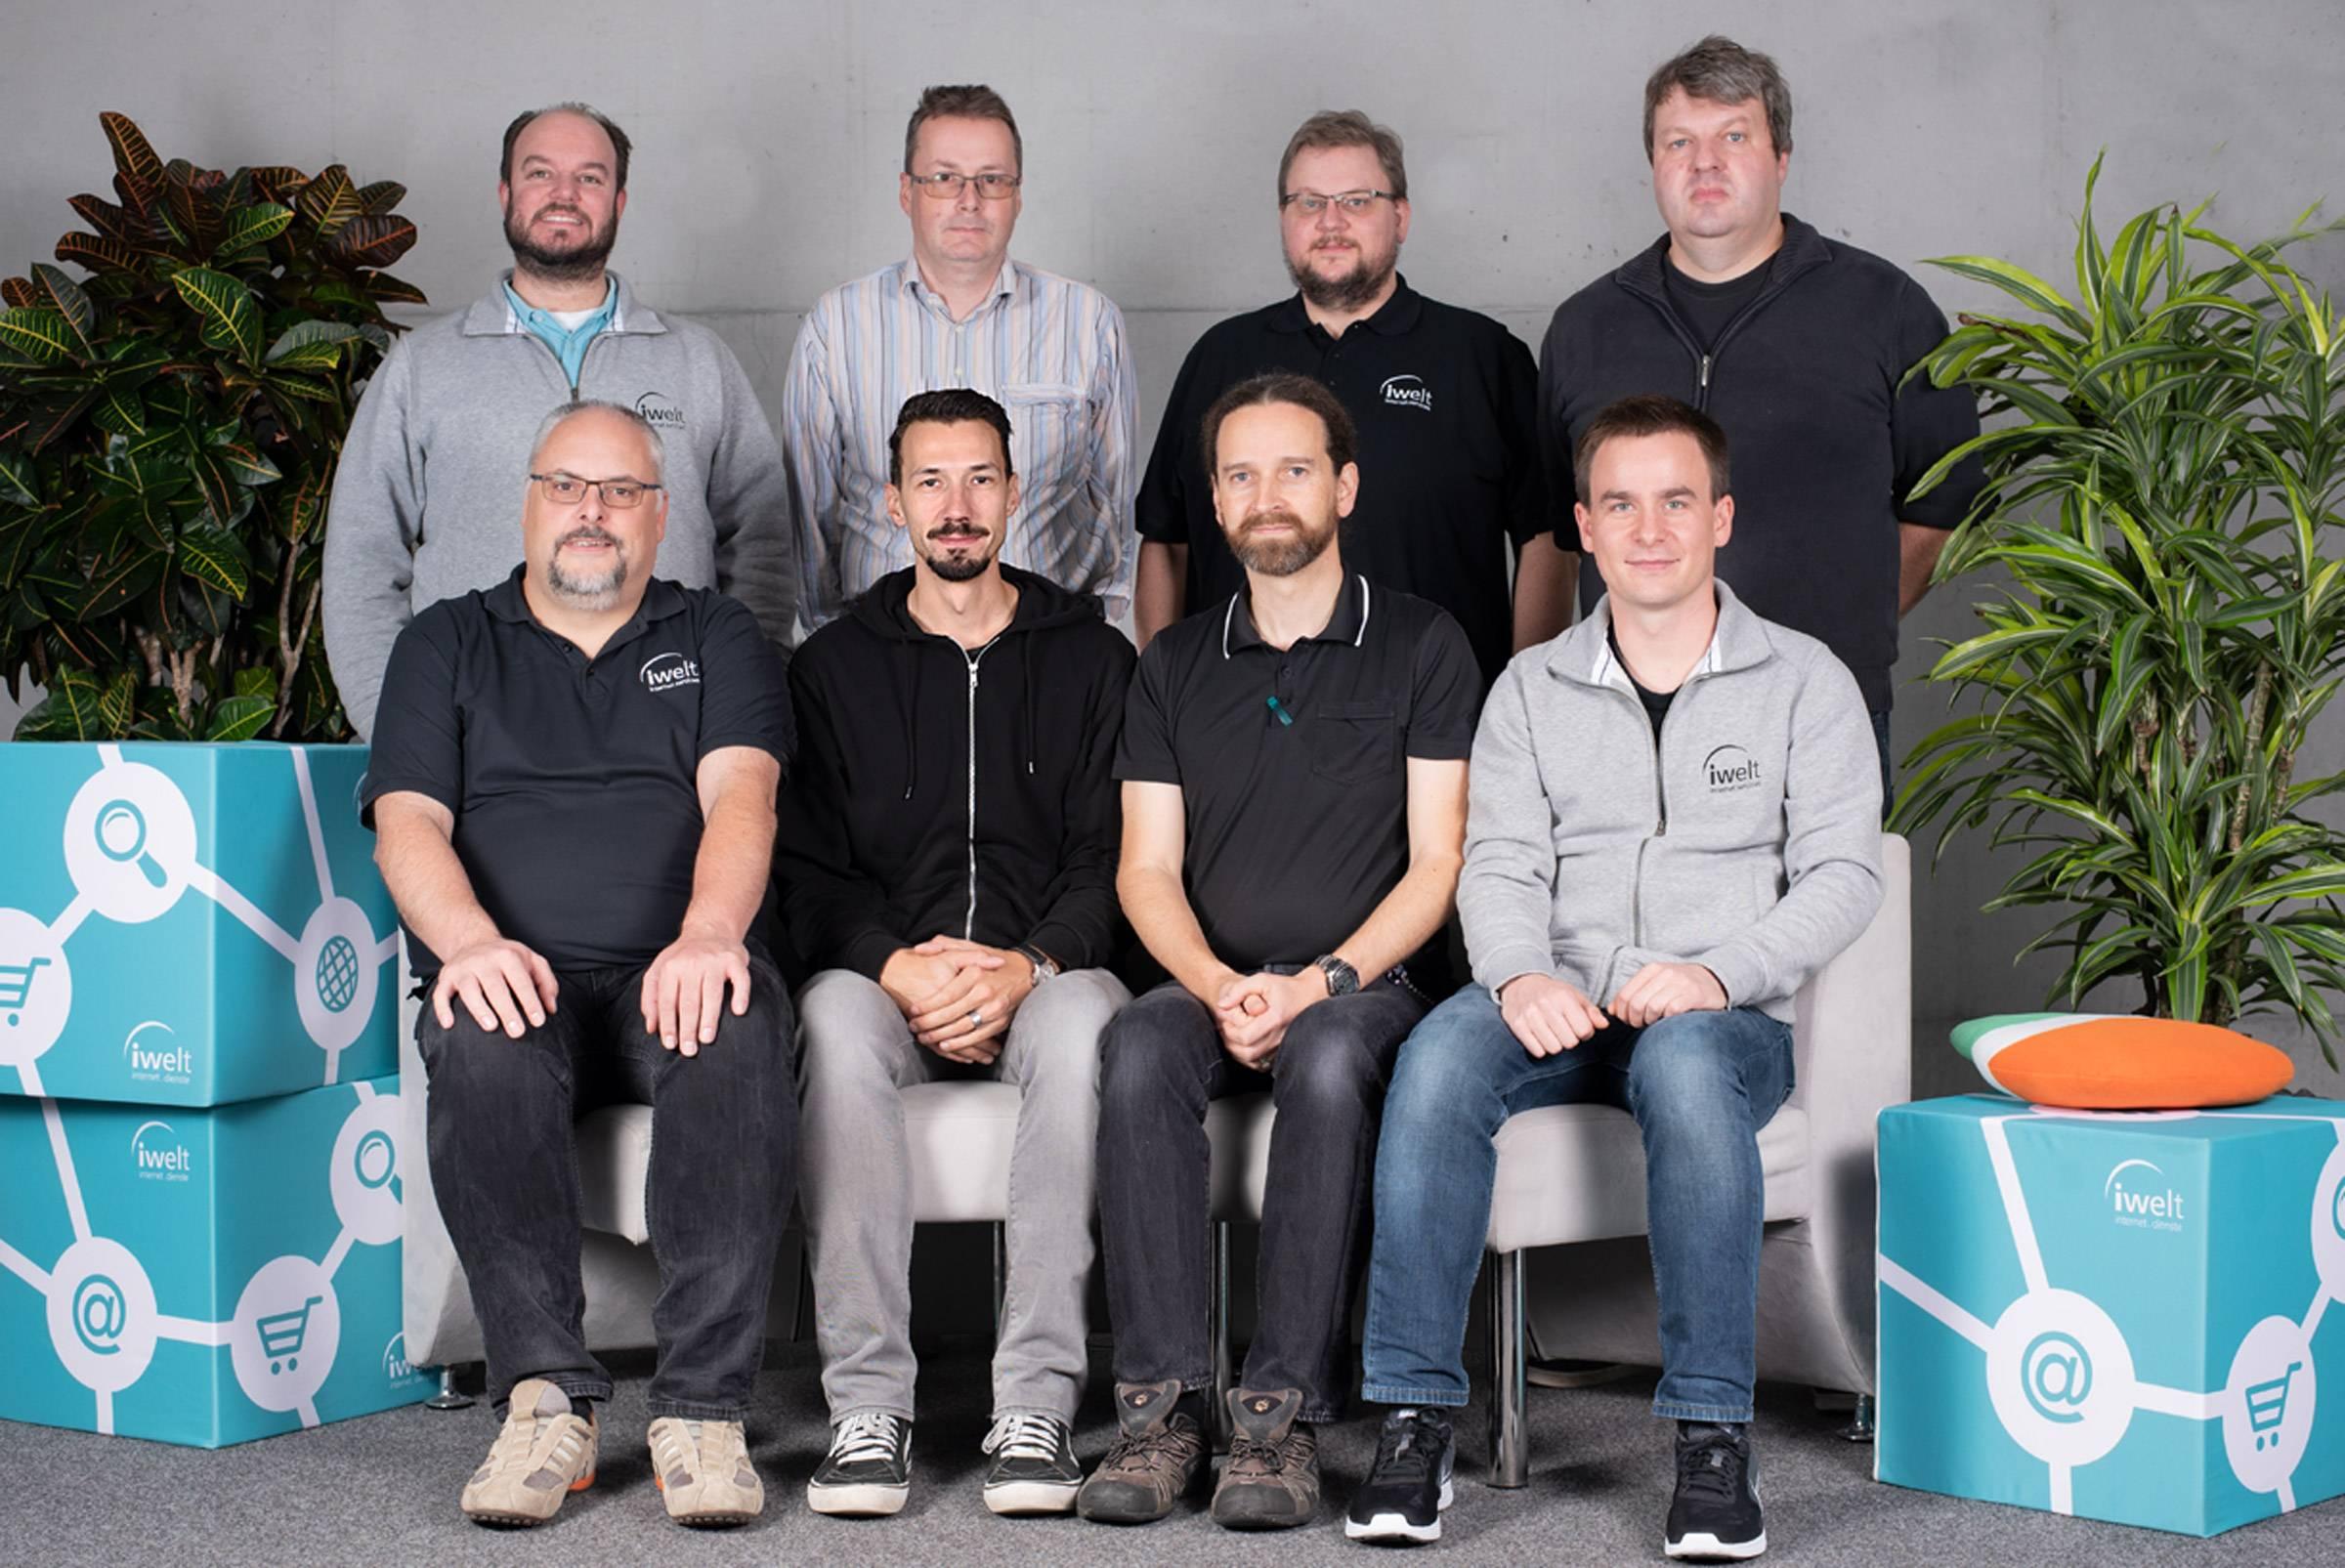 Team Core Services